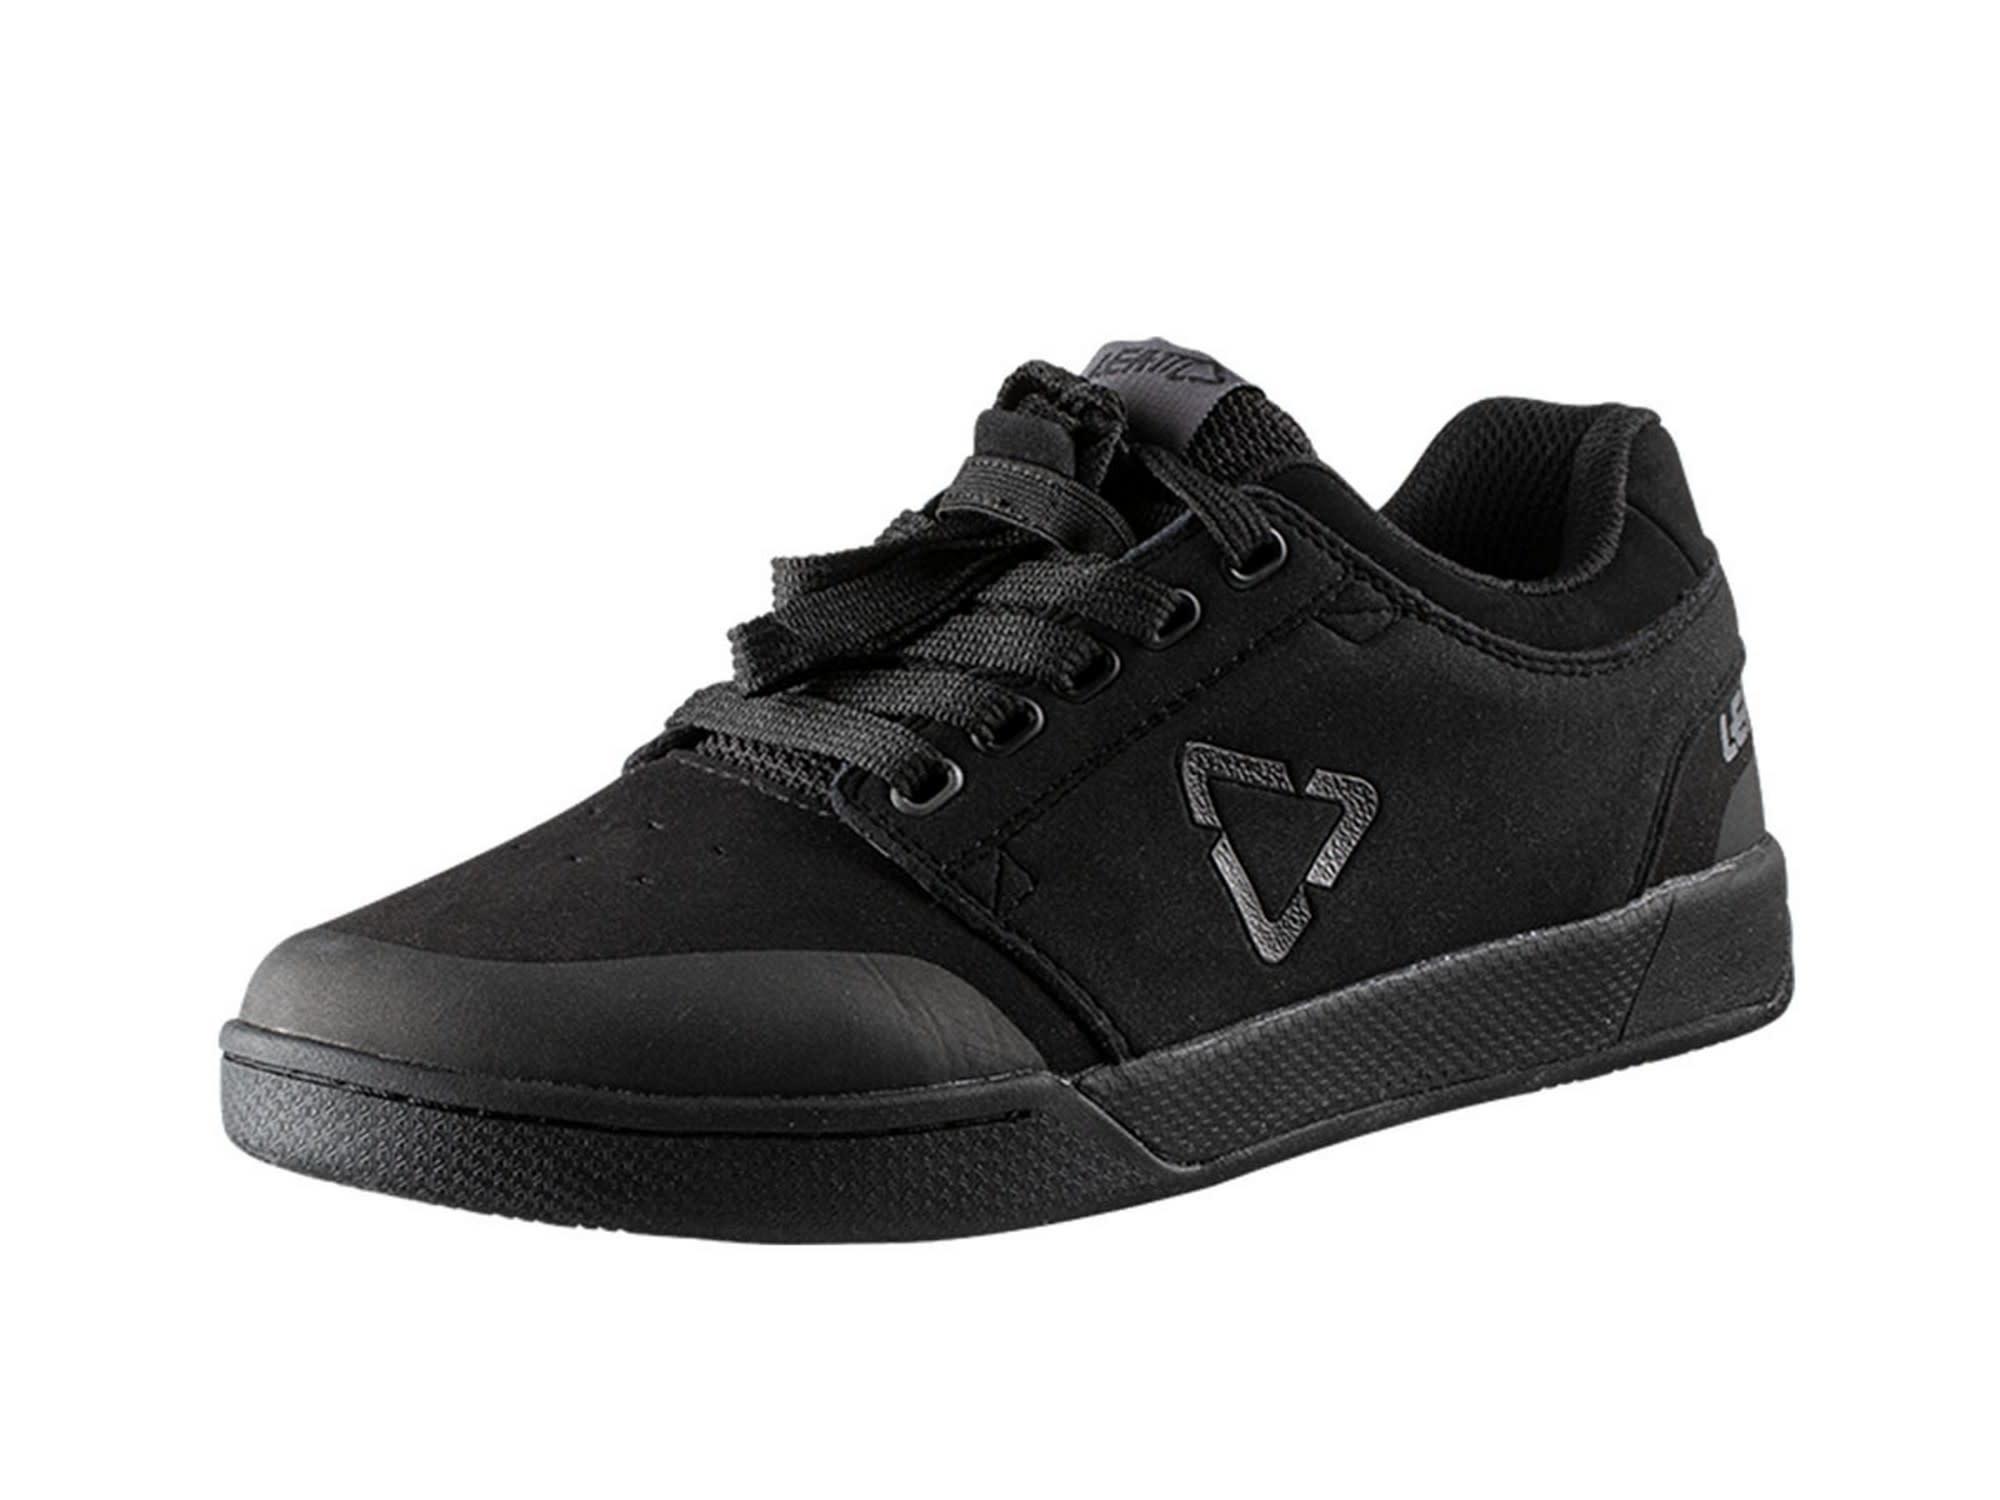 Leatt Leatt, DBX 2.0 Shoes, Black - 9.5